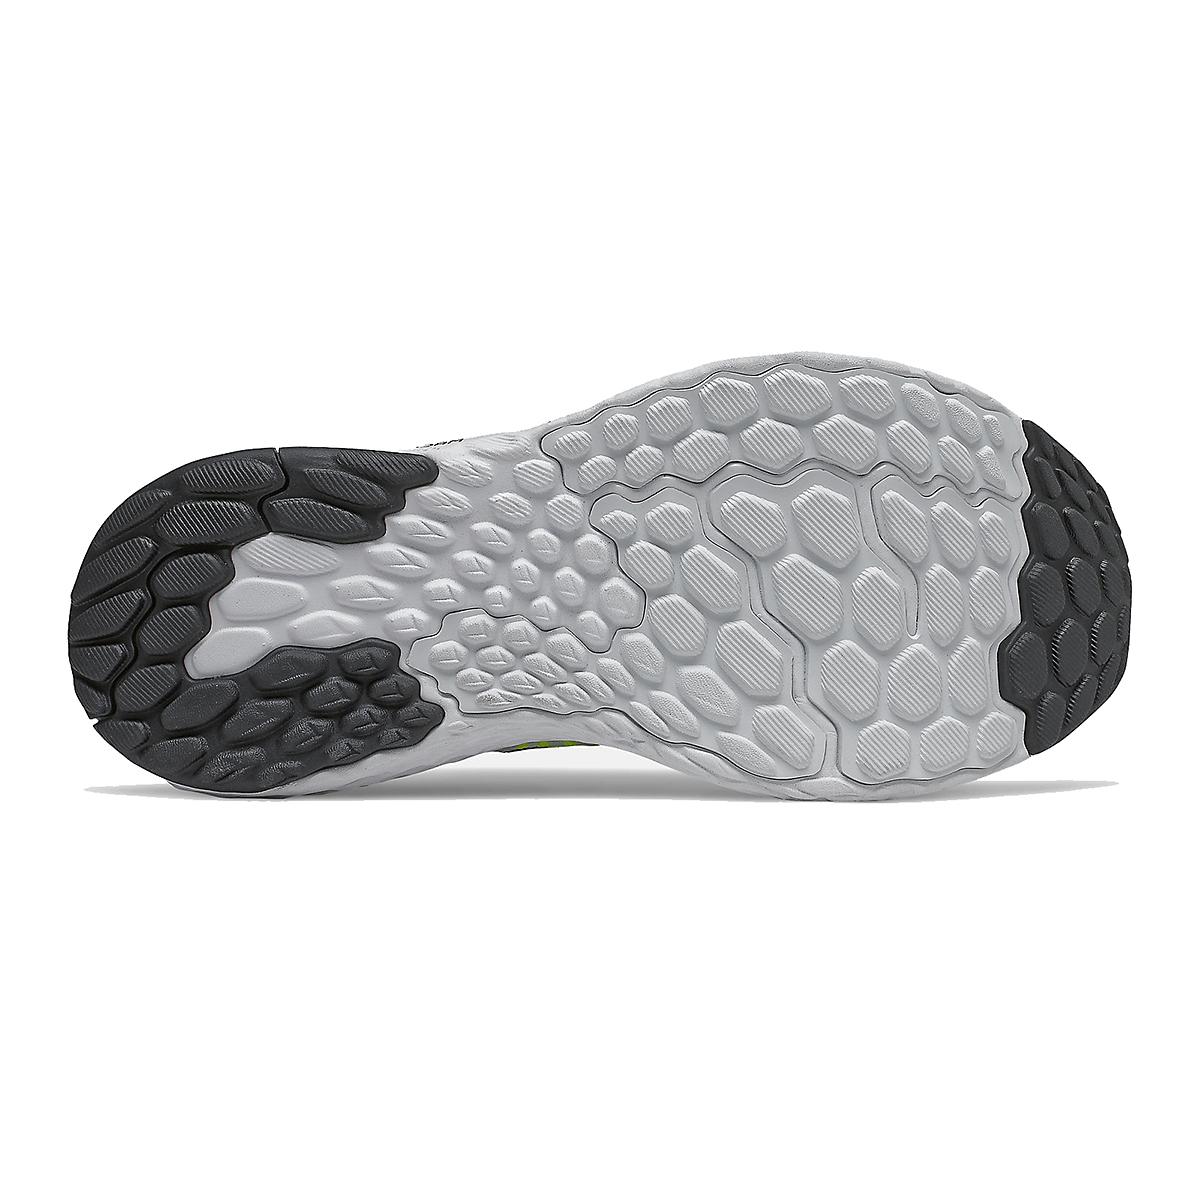 Women's New Balance Fresh Foam 1080v10 Running Shoe - Color: Light Aluminum - Size: 5.5 - Width: Extra Wide, Light Aluminum, large, image 3